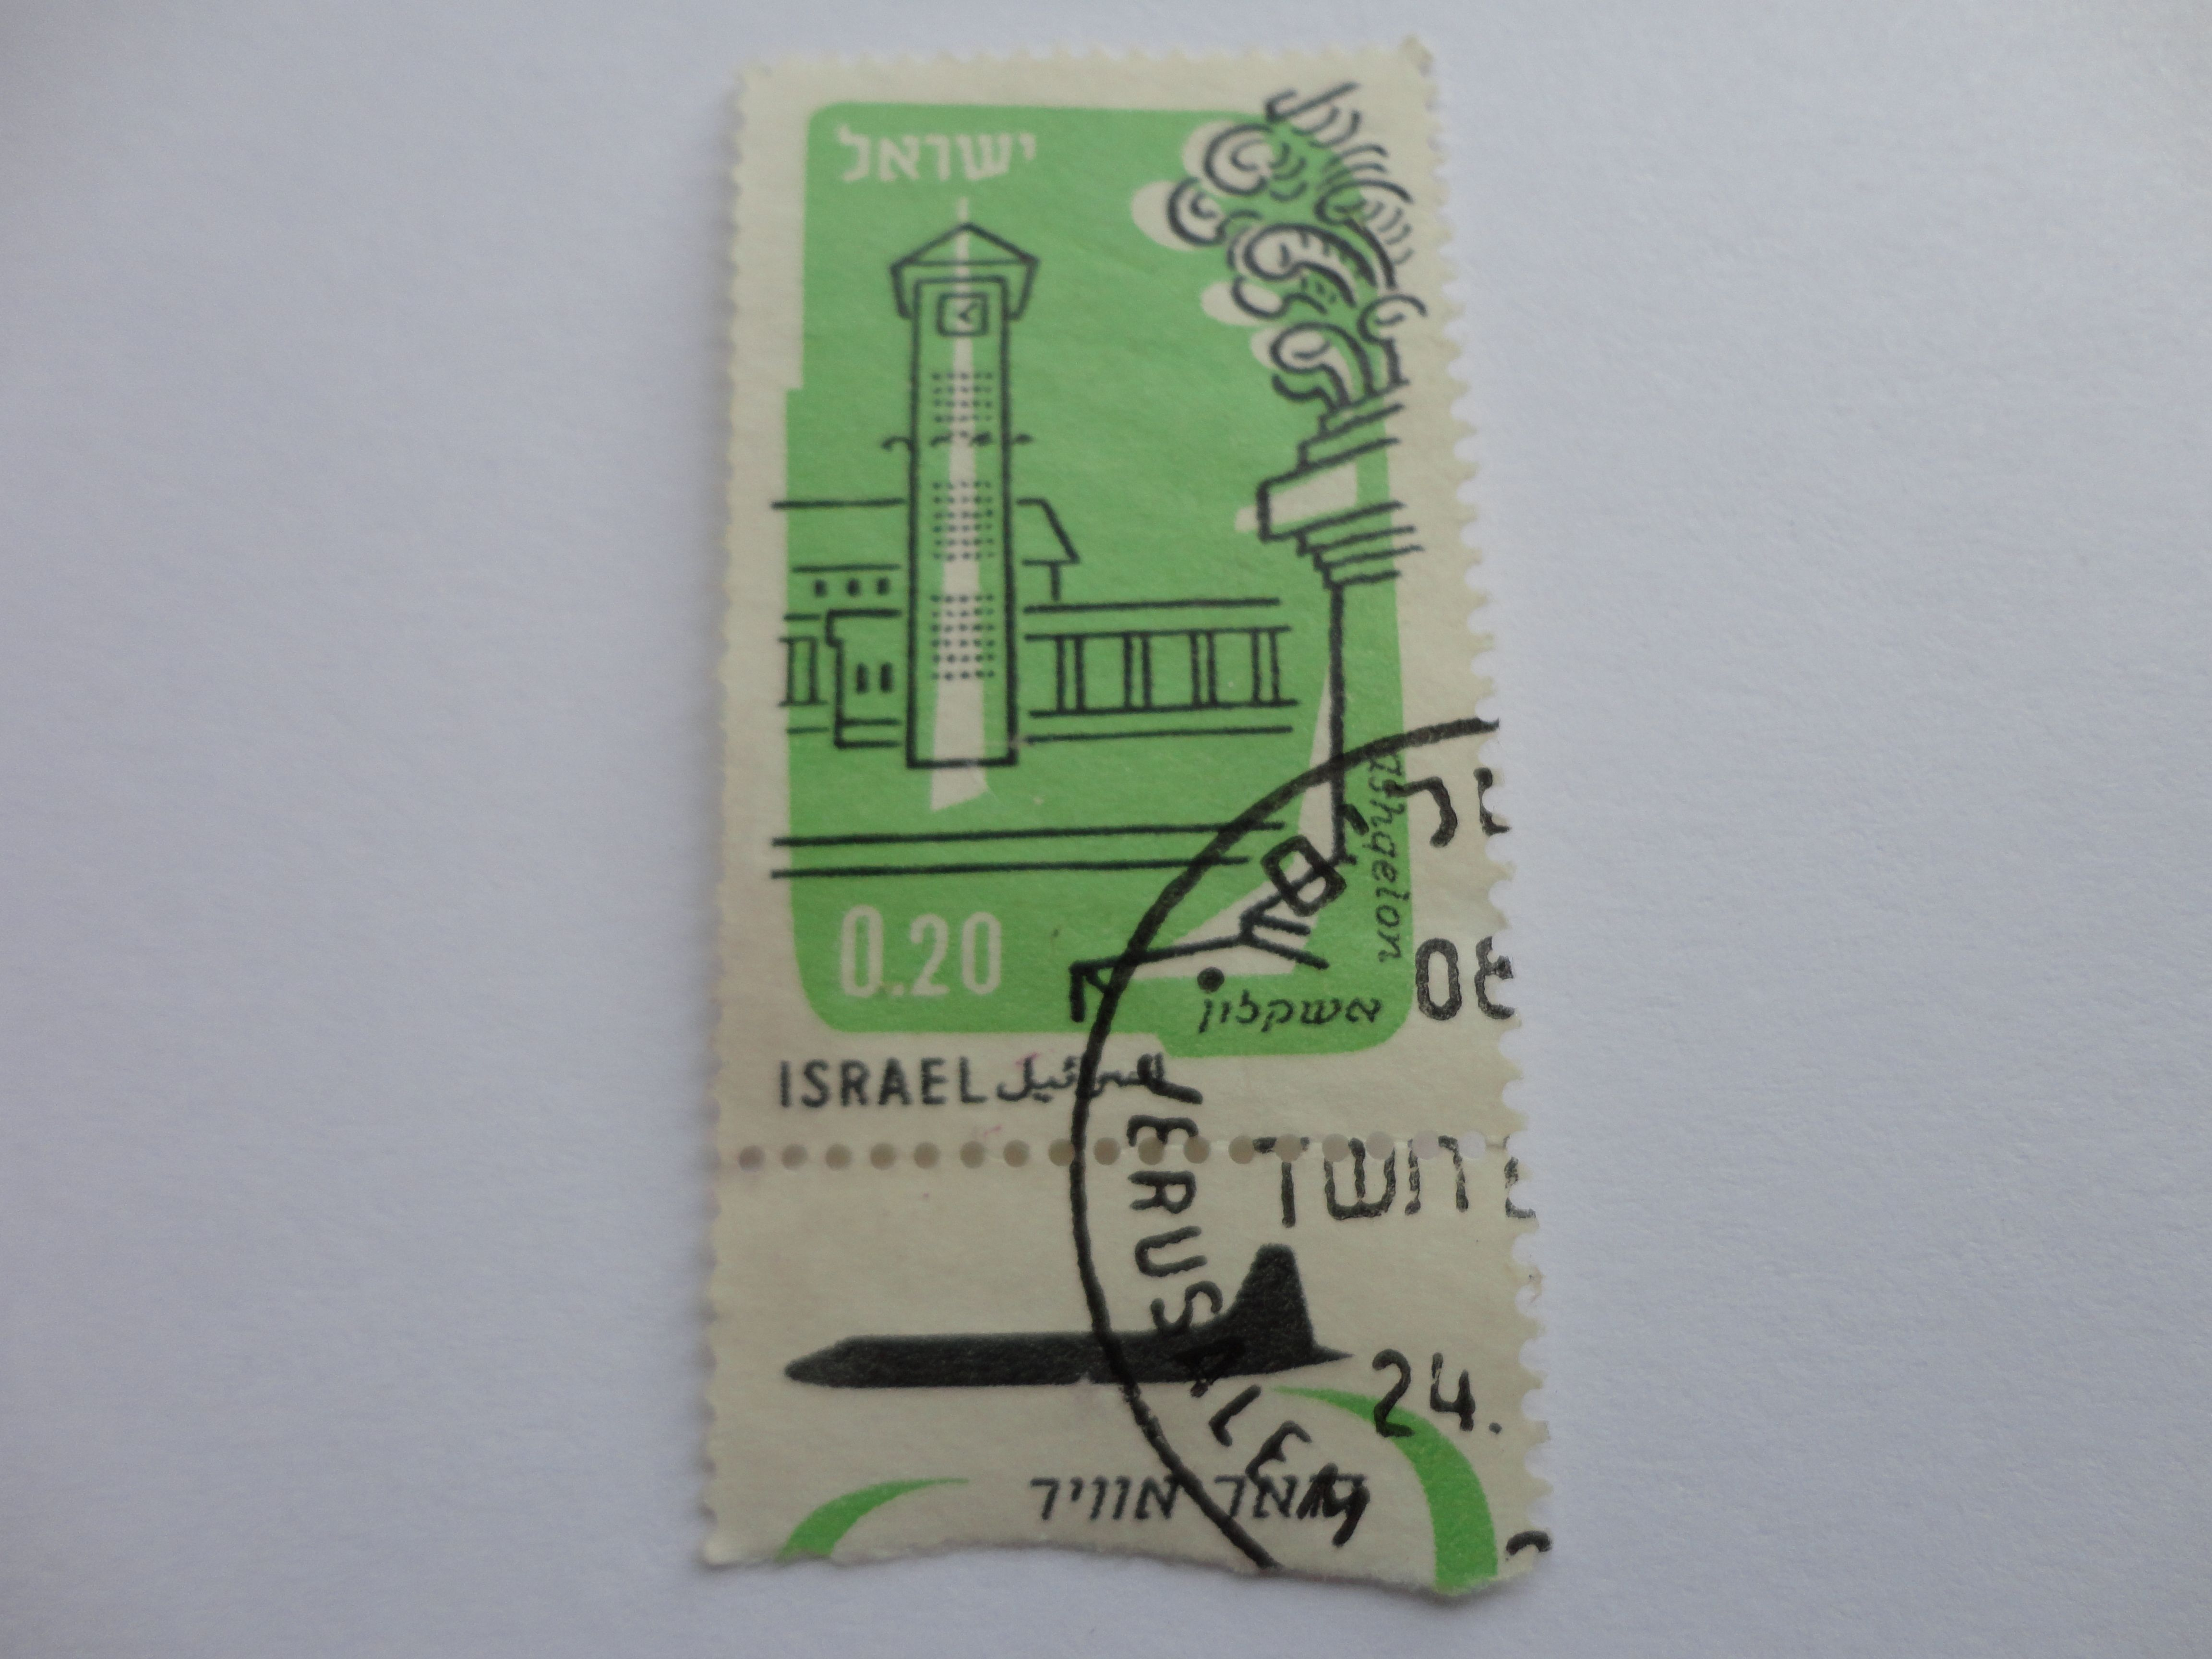 0.20 Israel Postage Stamp